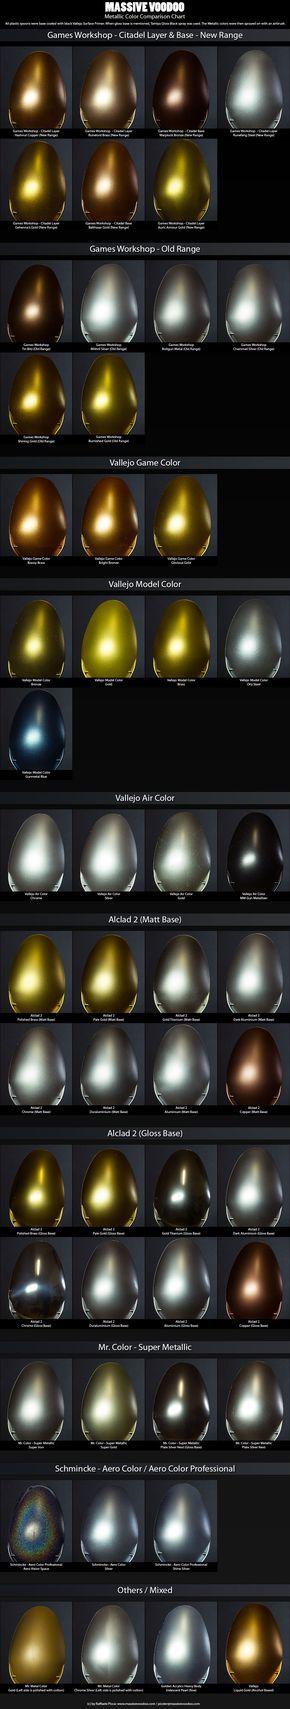 www.pixelgod.net massivevoodoo metallic_color_comparison_chart.jpg